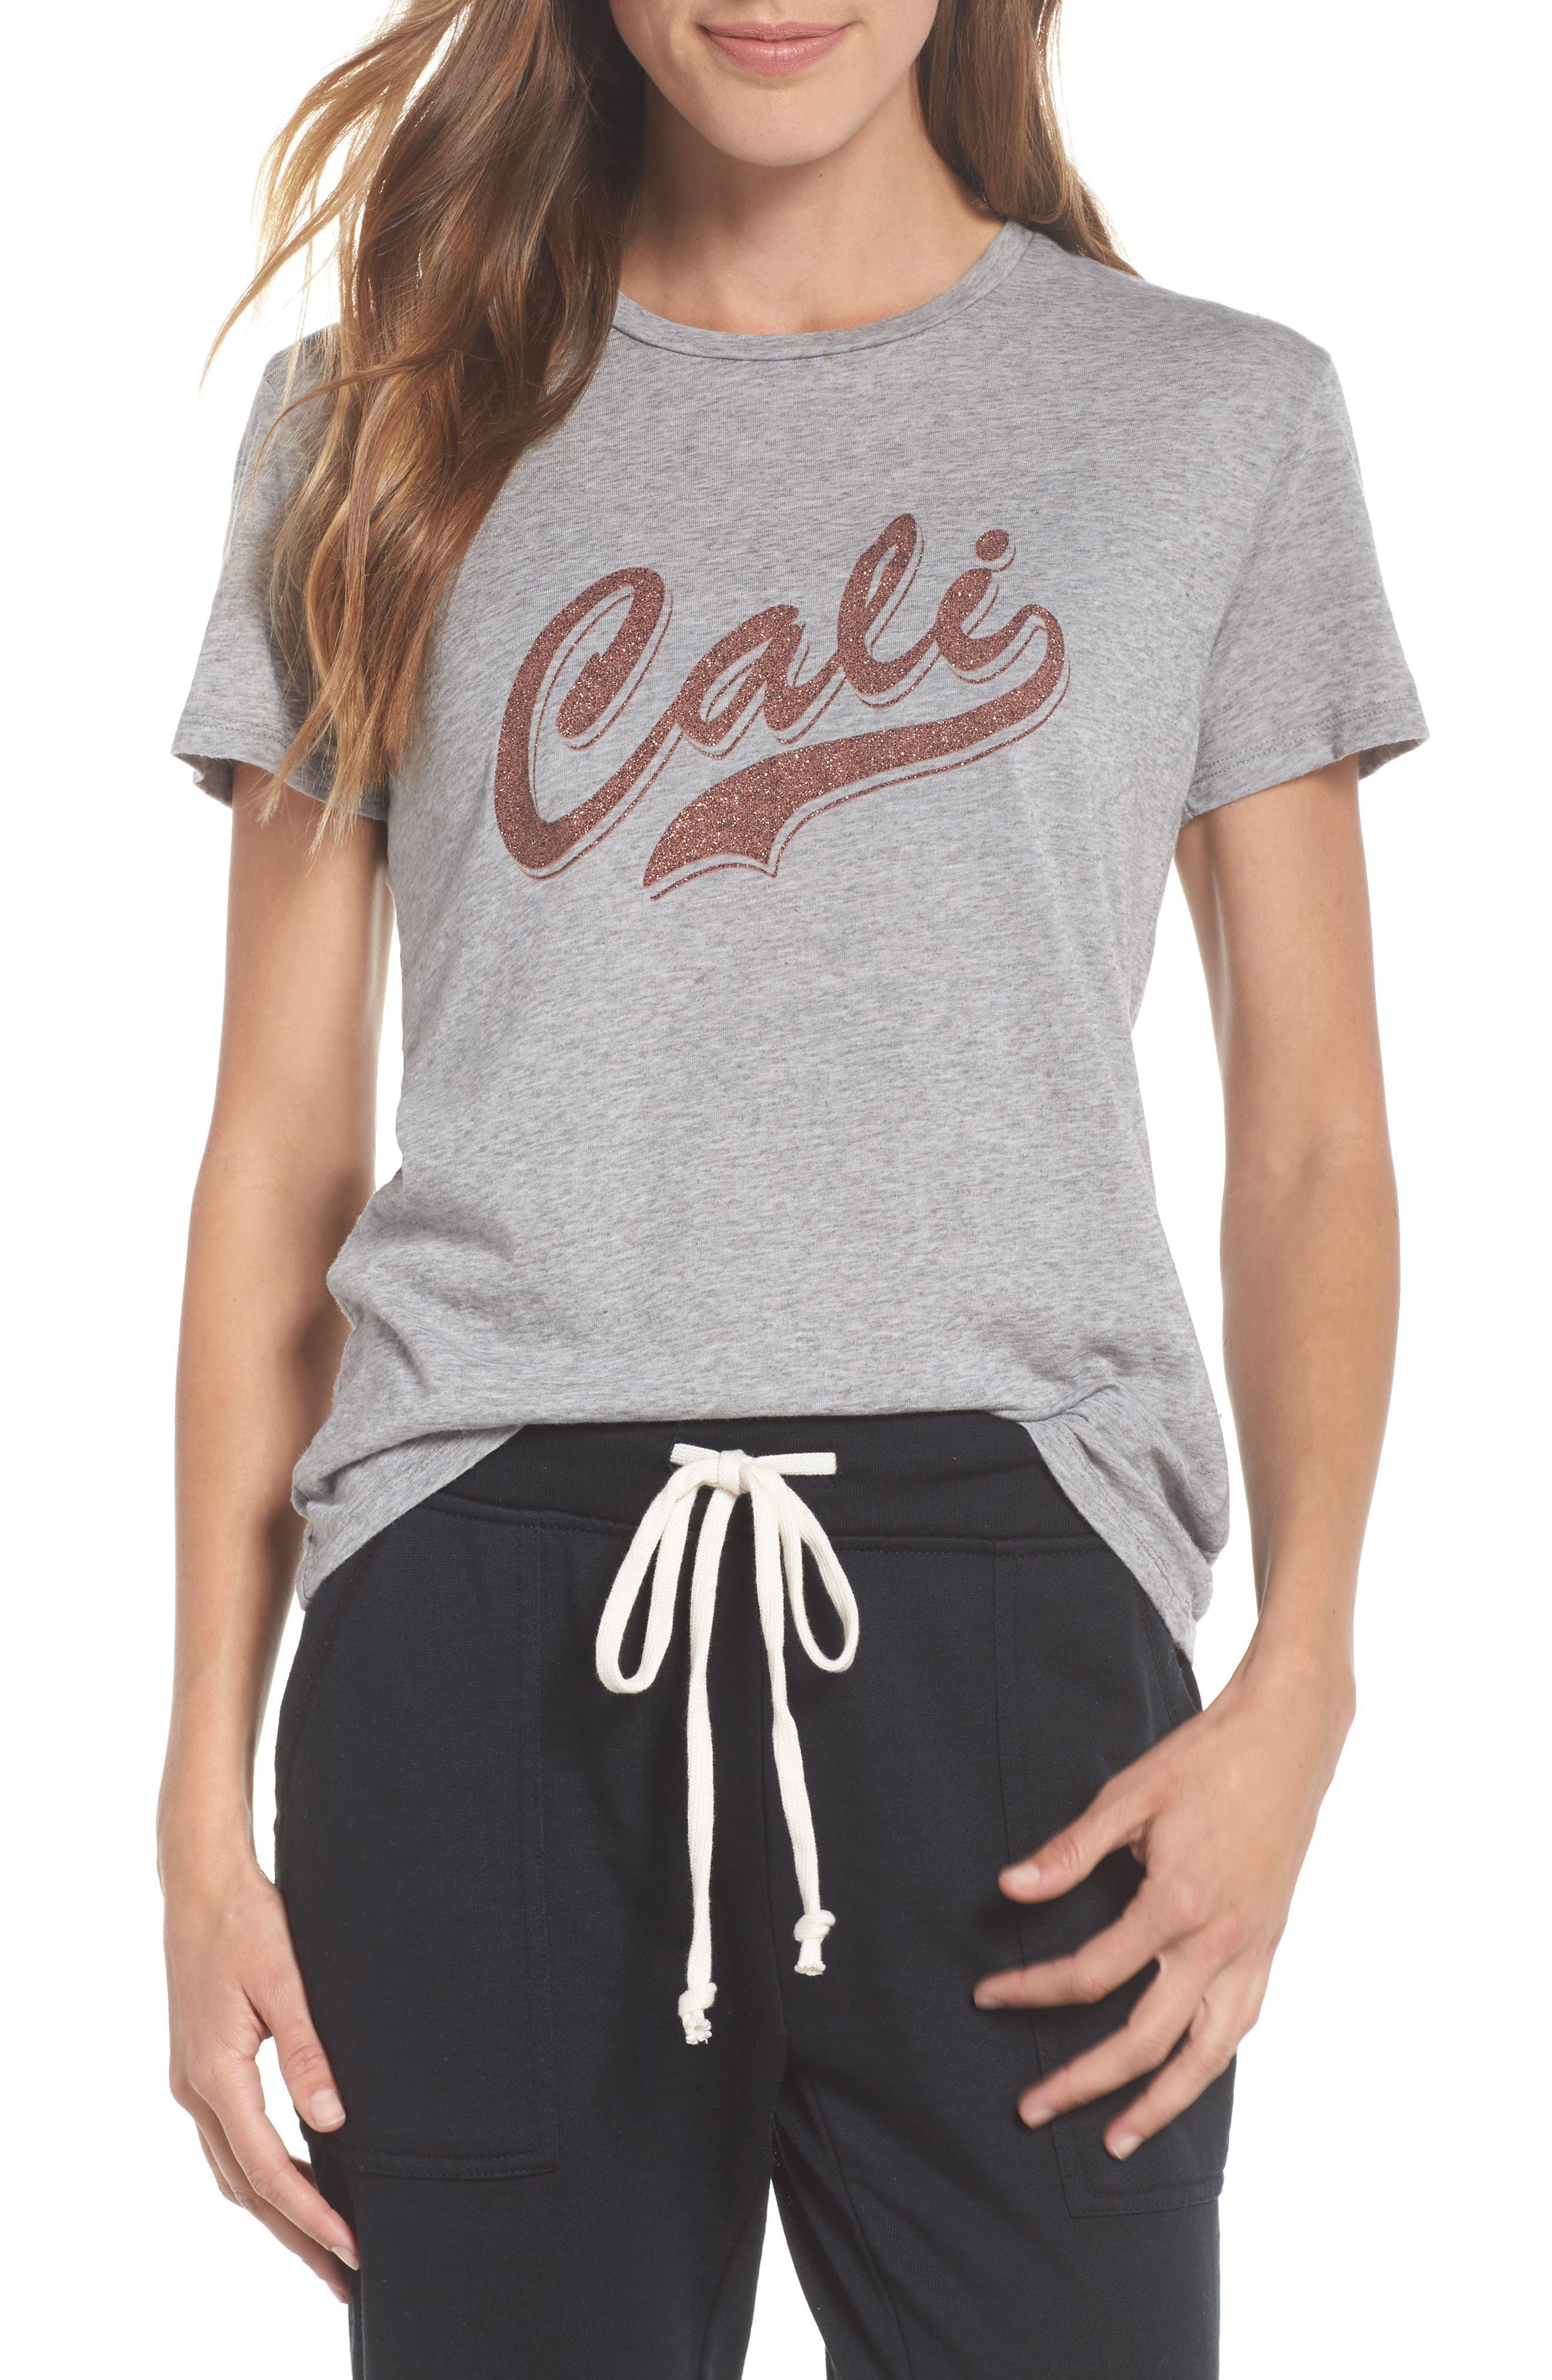 Cali Tee,                         Main,                         color, Heather Grey